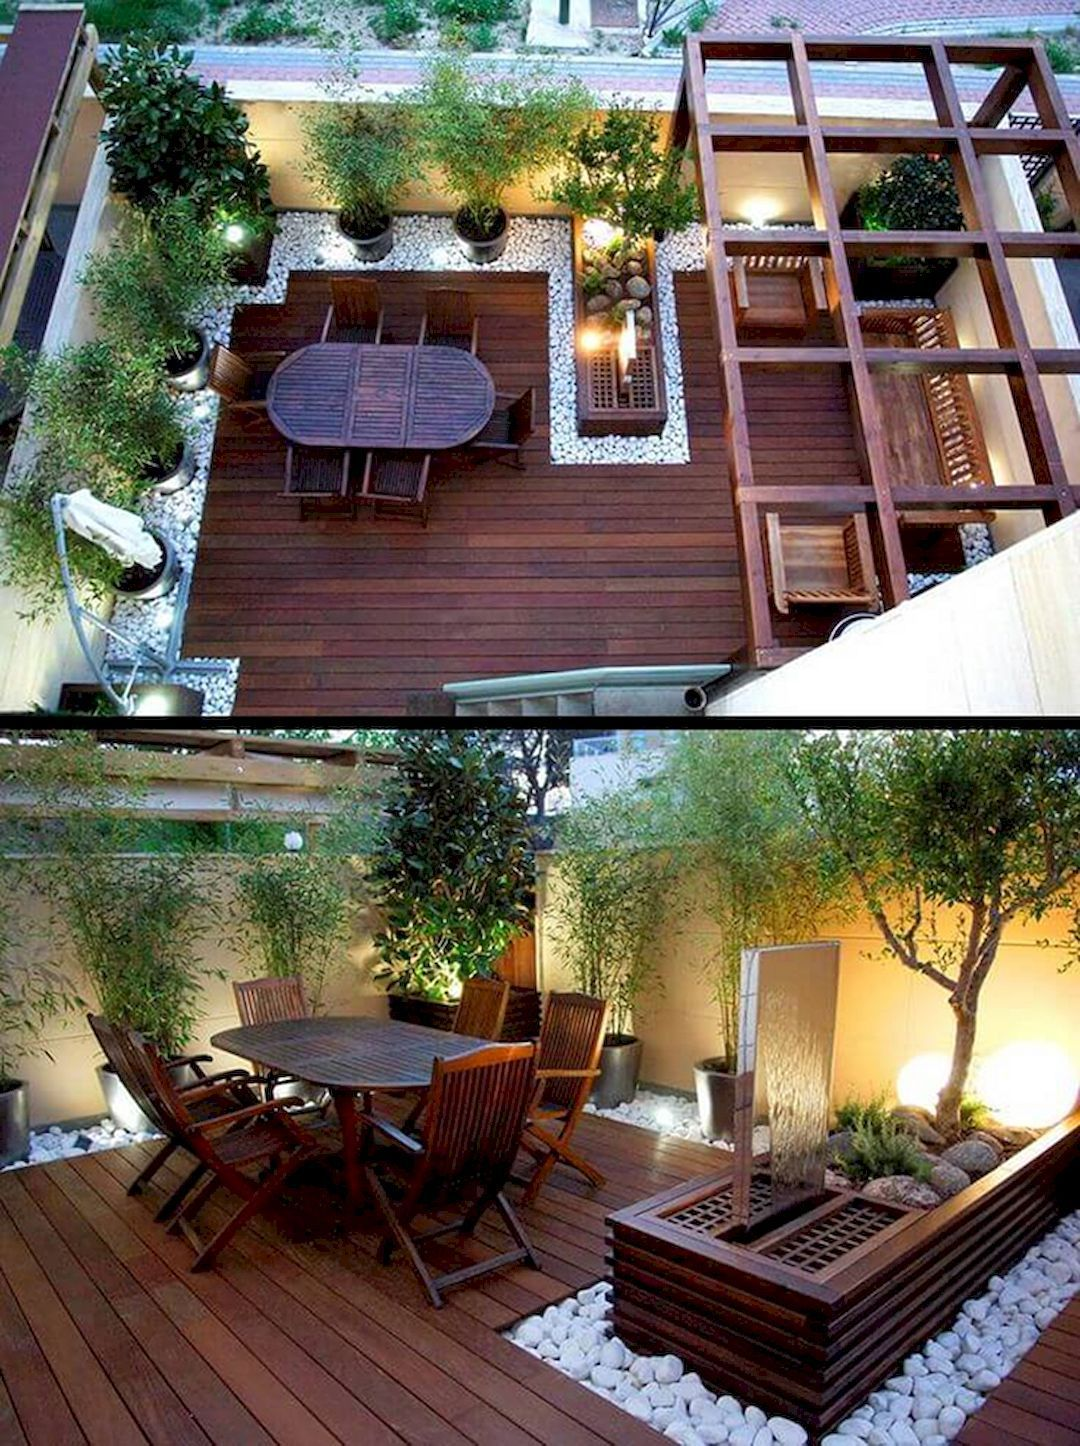 4 Tips To Start Building a Backyard Deck | Terrazas, Zen y Jardín